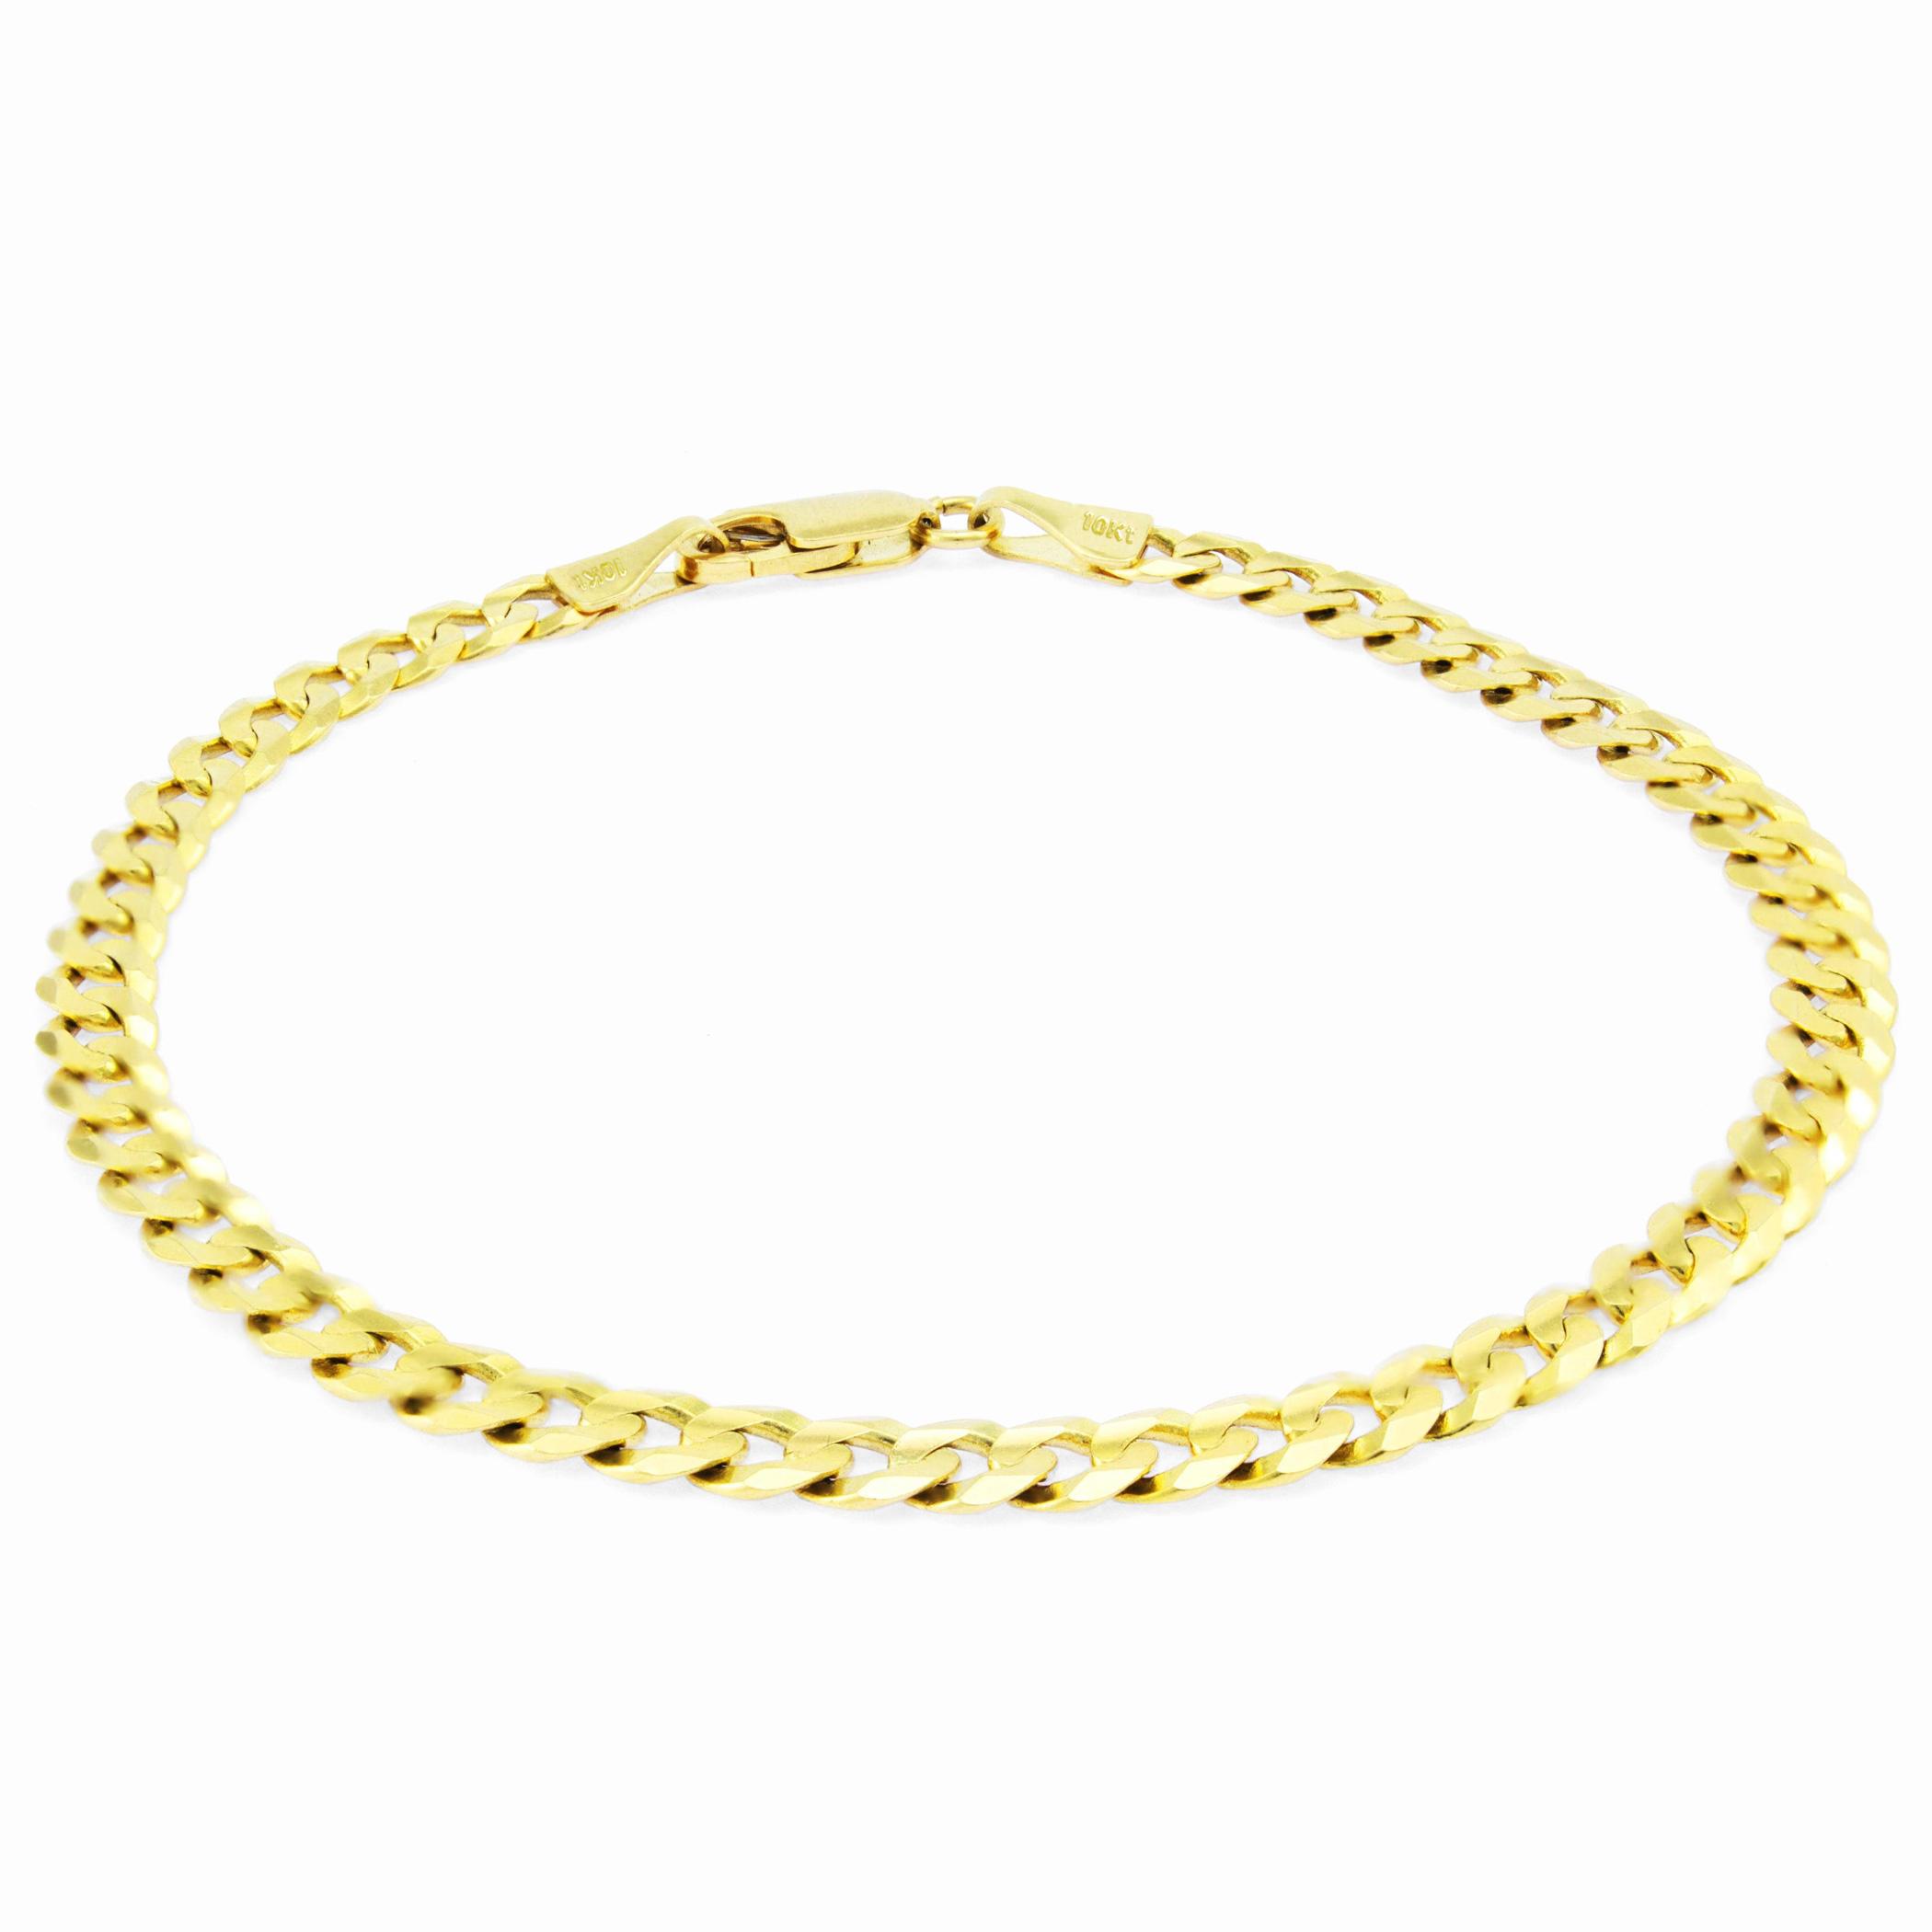 10K-Yellow-Gold-5-5mm-Cuban-Curb-Chain-Bracelet-Lobster-Clasp-Men-Women-7-034-8-034-9-034 thumbnail 16